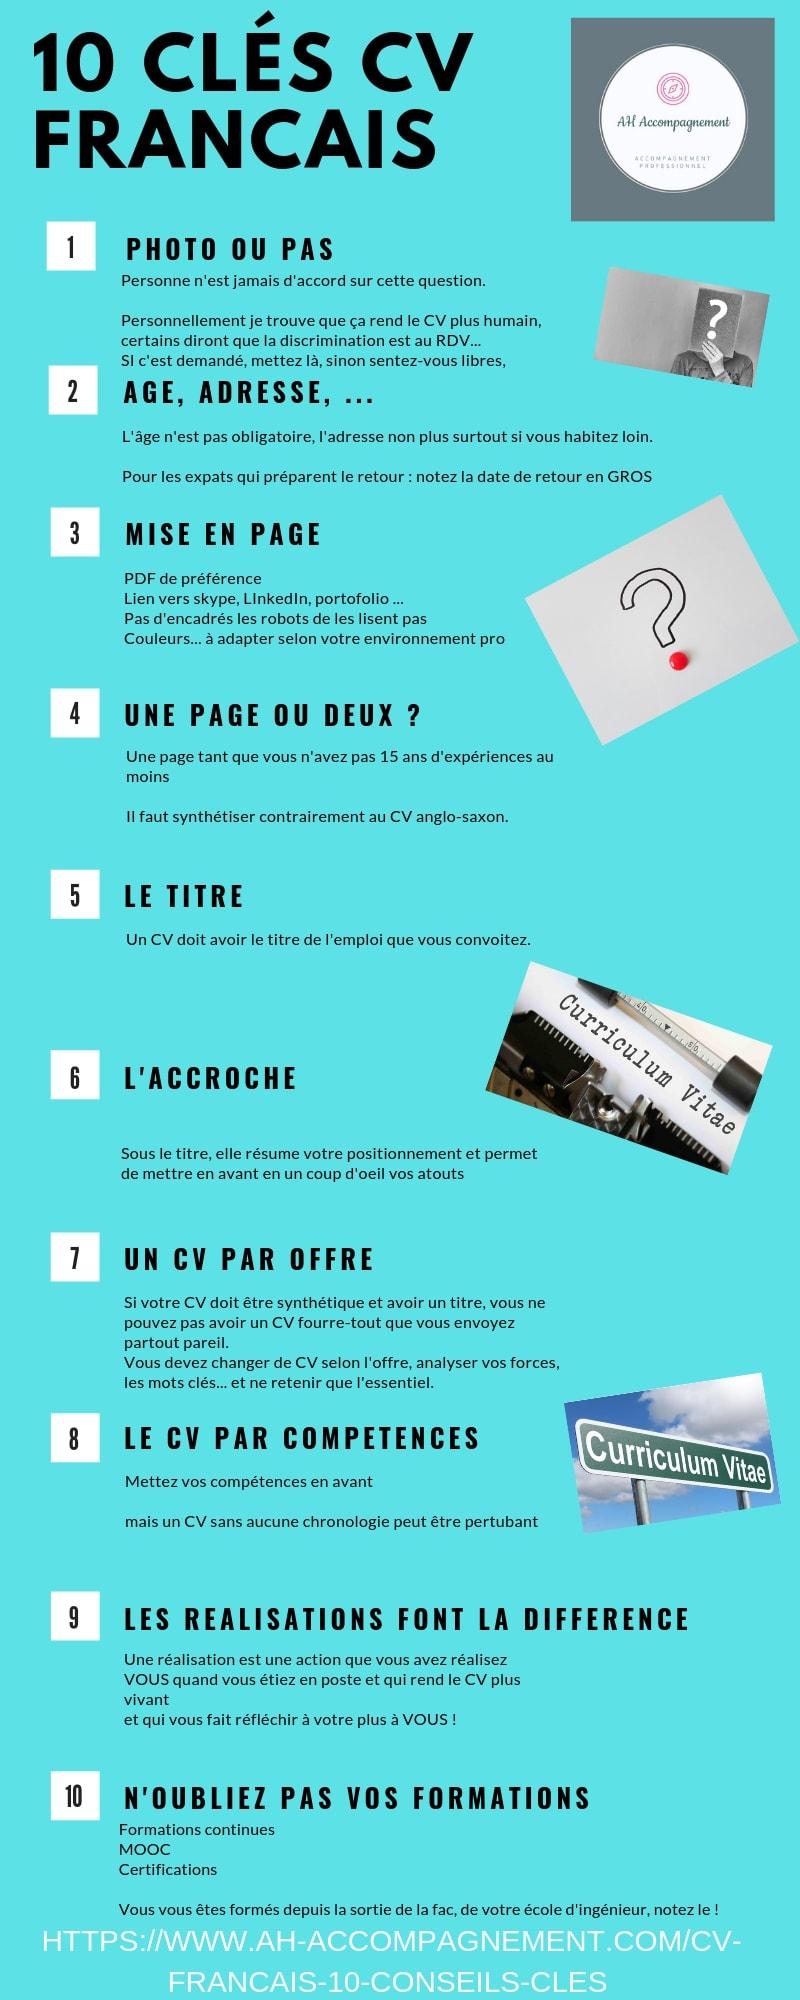 10 clés cv francais